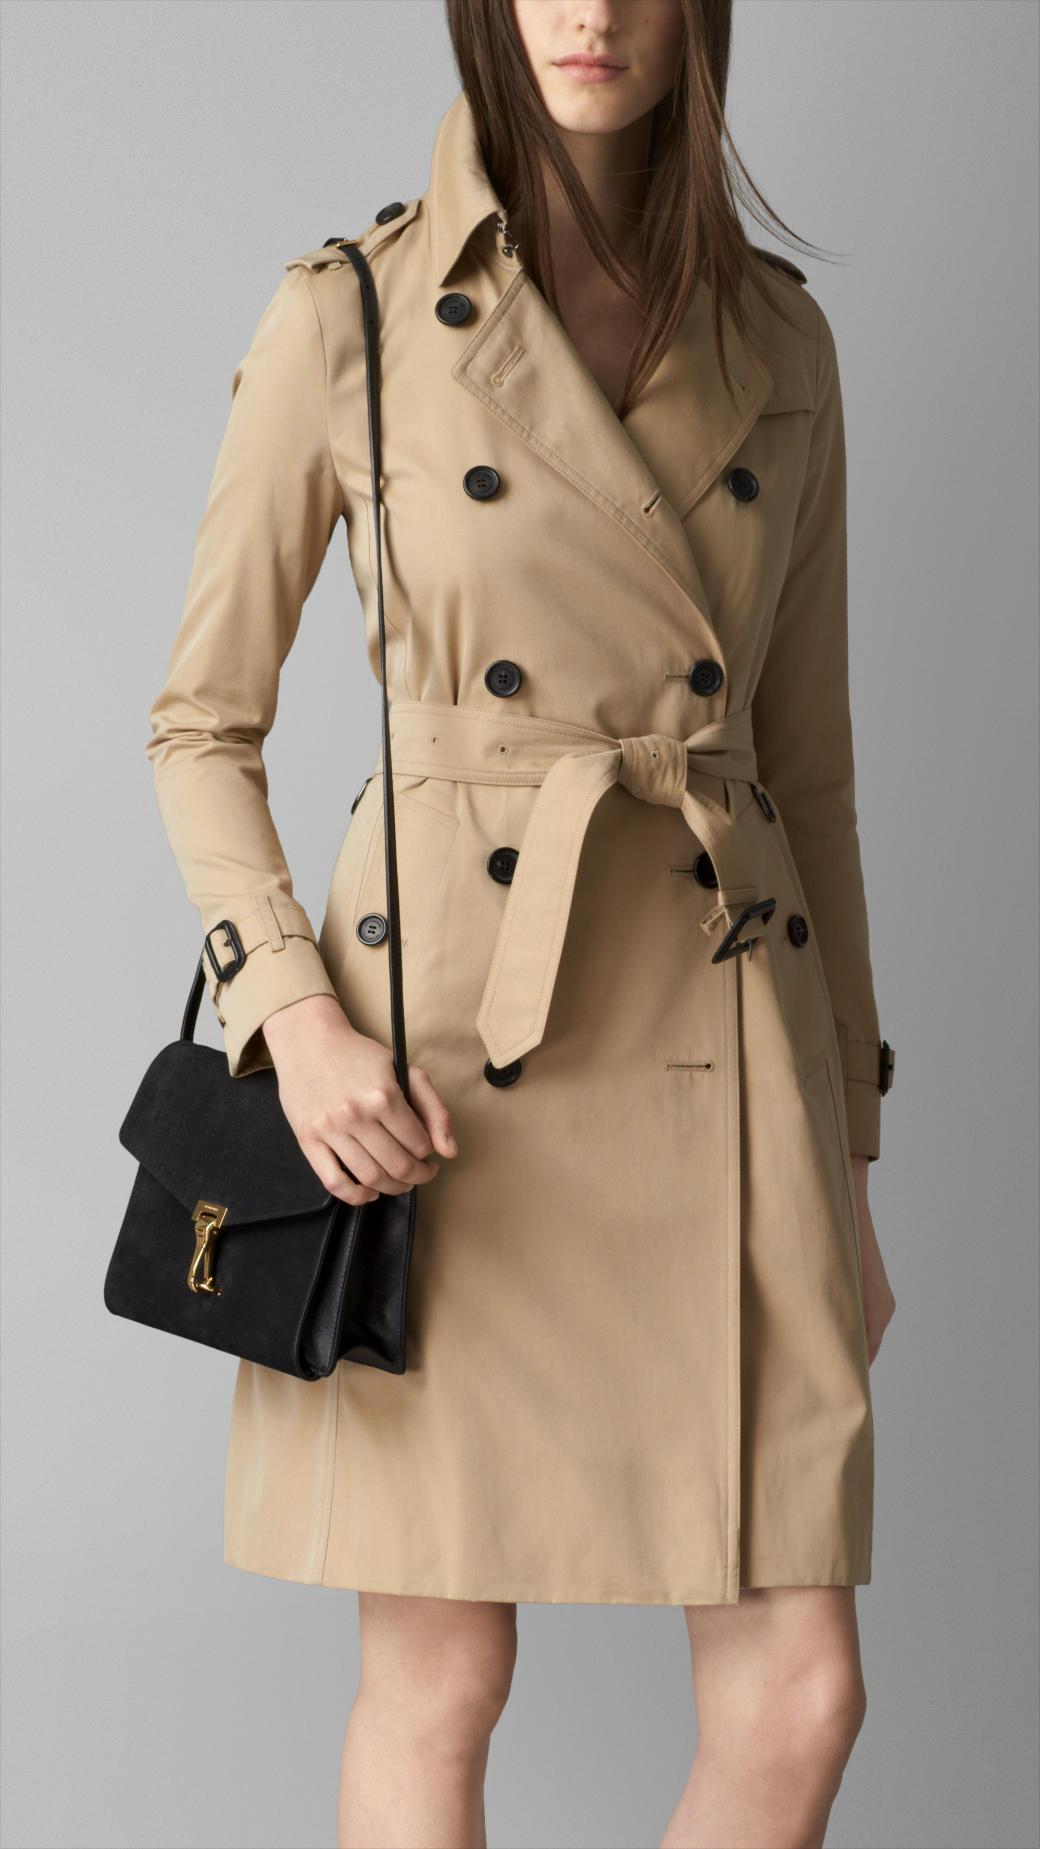 3ae706e541e1 Lyst - Burberry Nubuck Leather Crossbody Bag in Black